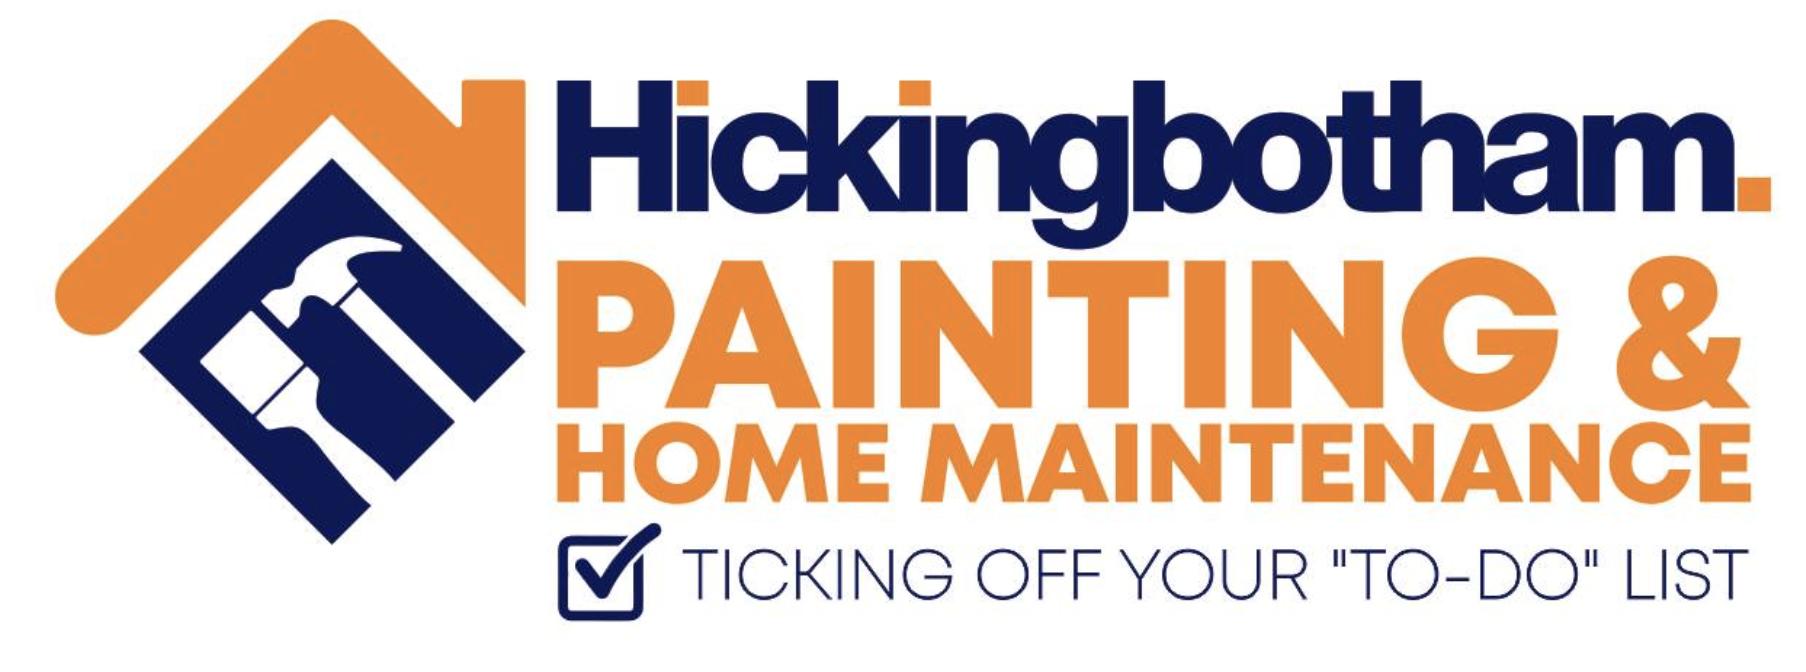 Hickingbotham Painting and Home Maintenance